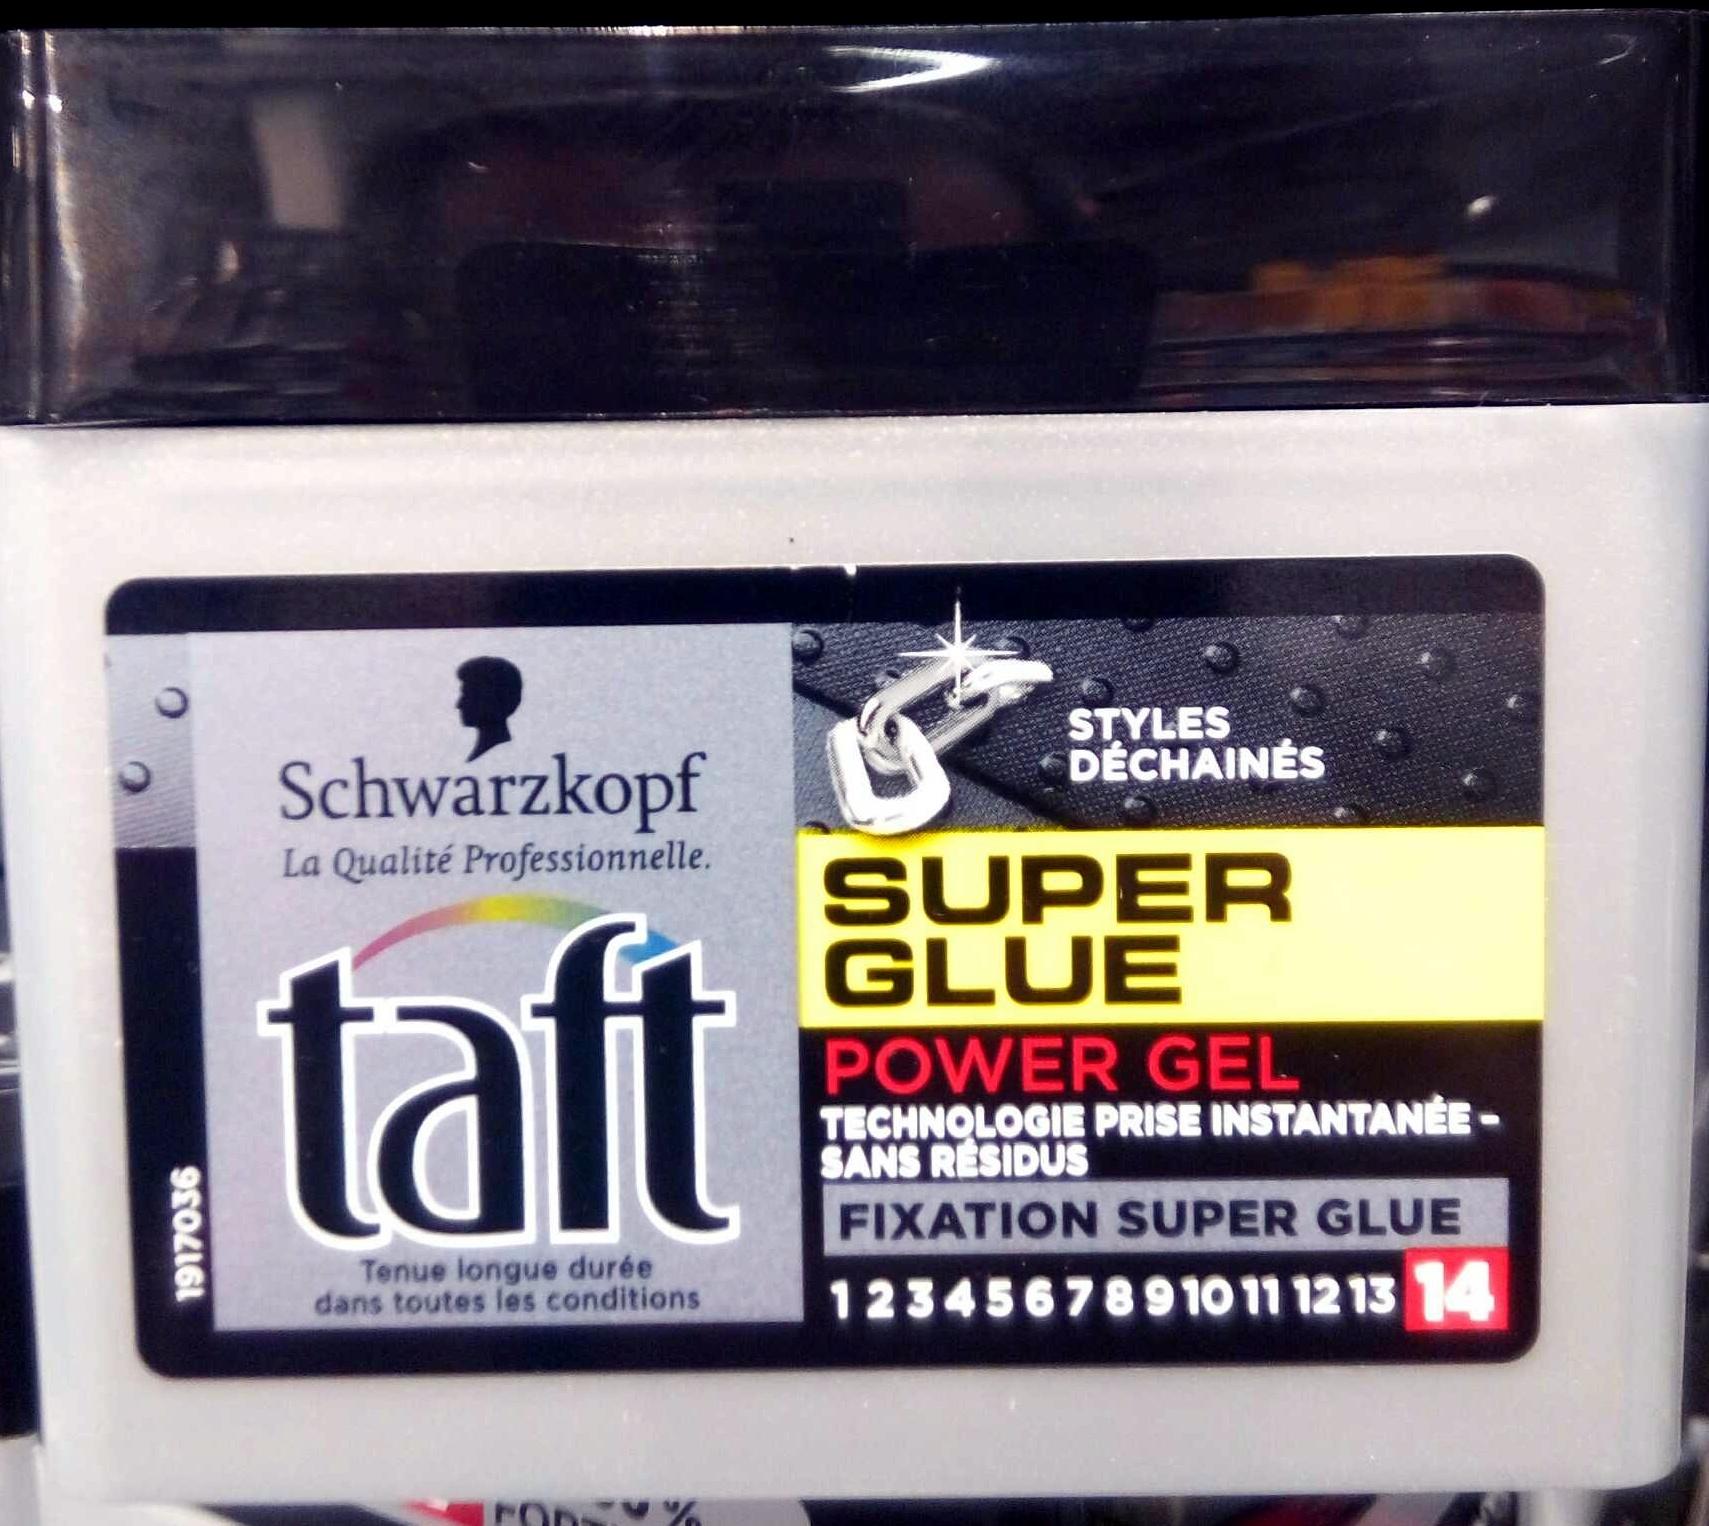 Super Glue Power Gel - Product